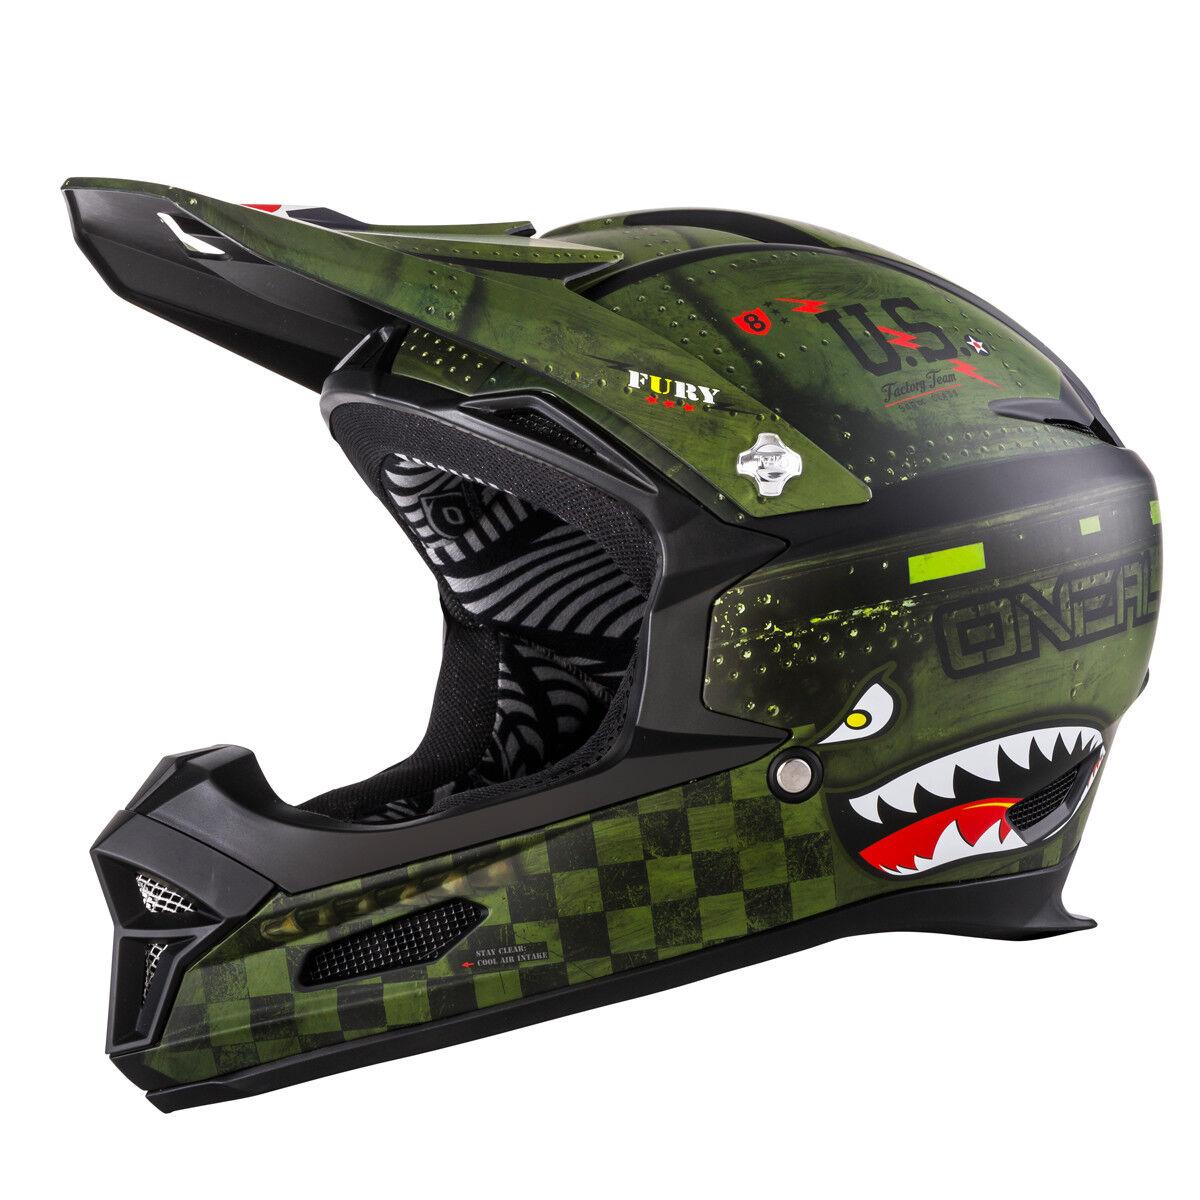 O 'Neal Fury Warhawk RL DH Vélo Casque vert noir 2019 ONEAL